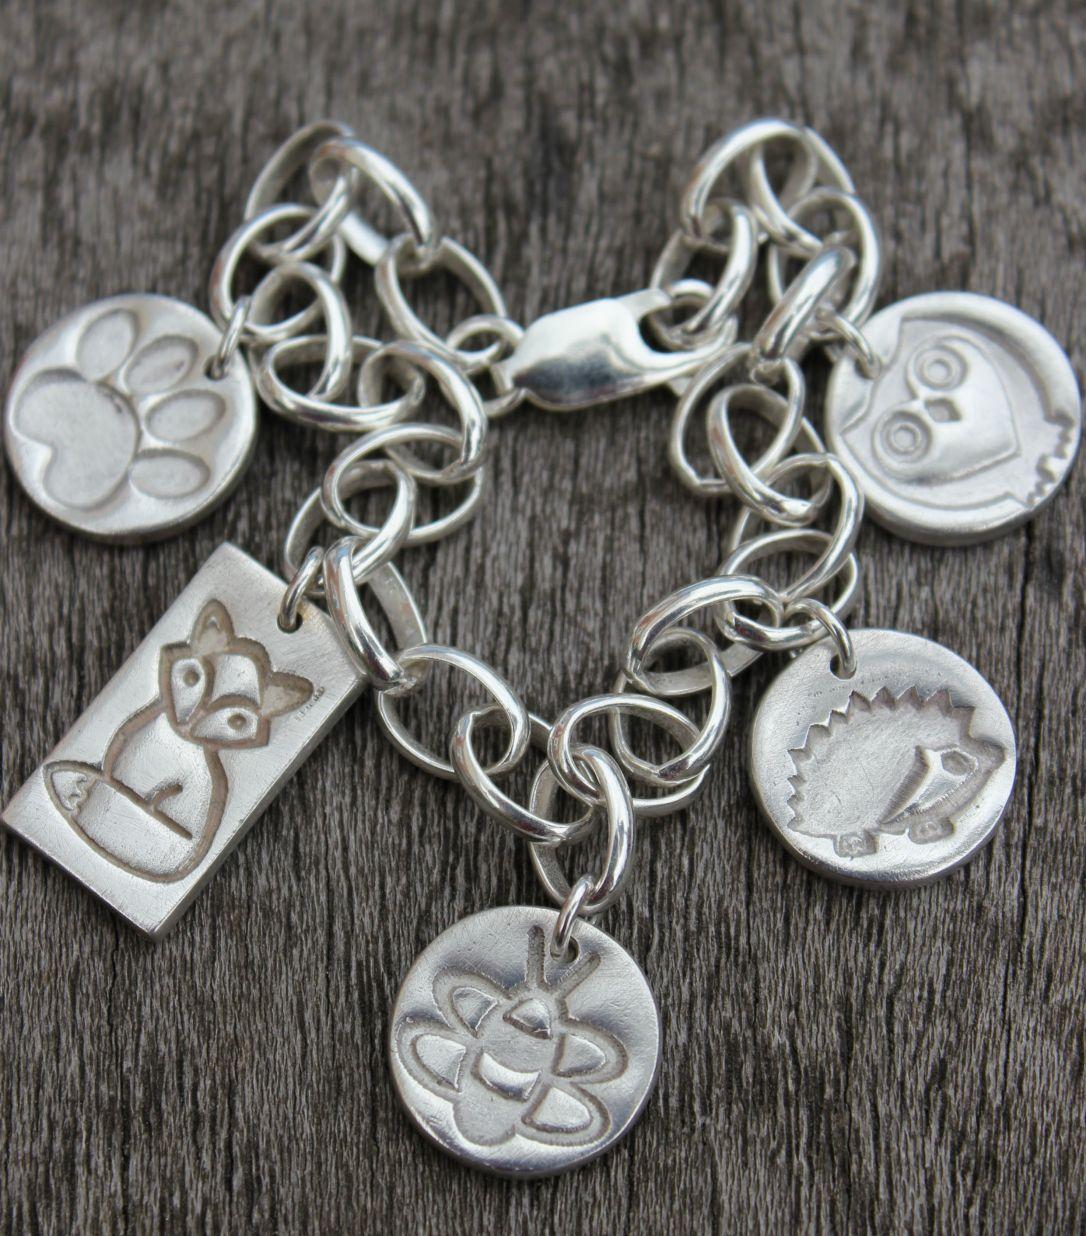 woodland charm bracelet, british wildlife charm bracelet, silver wildlife charm bracelet, nature lover silver charm bracelet